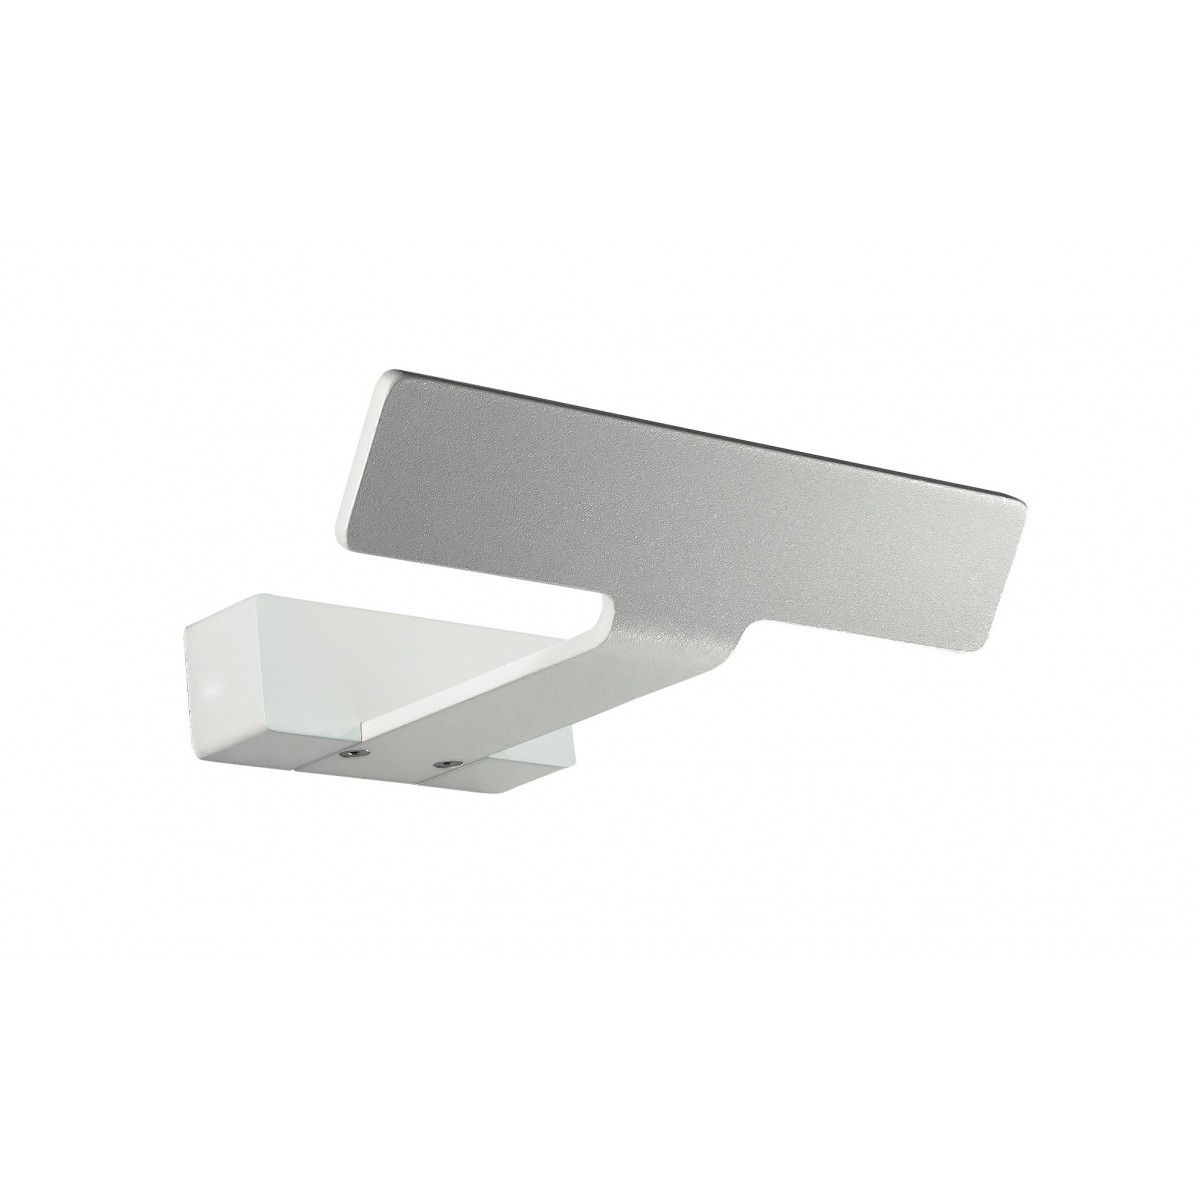 LED-W-PEGASO / 4W - Applique blanche de